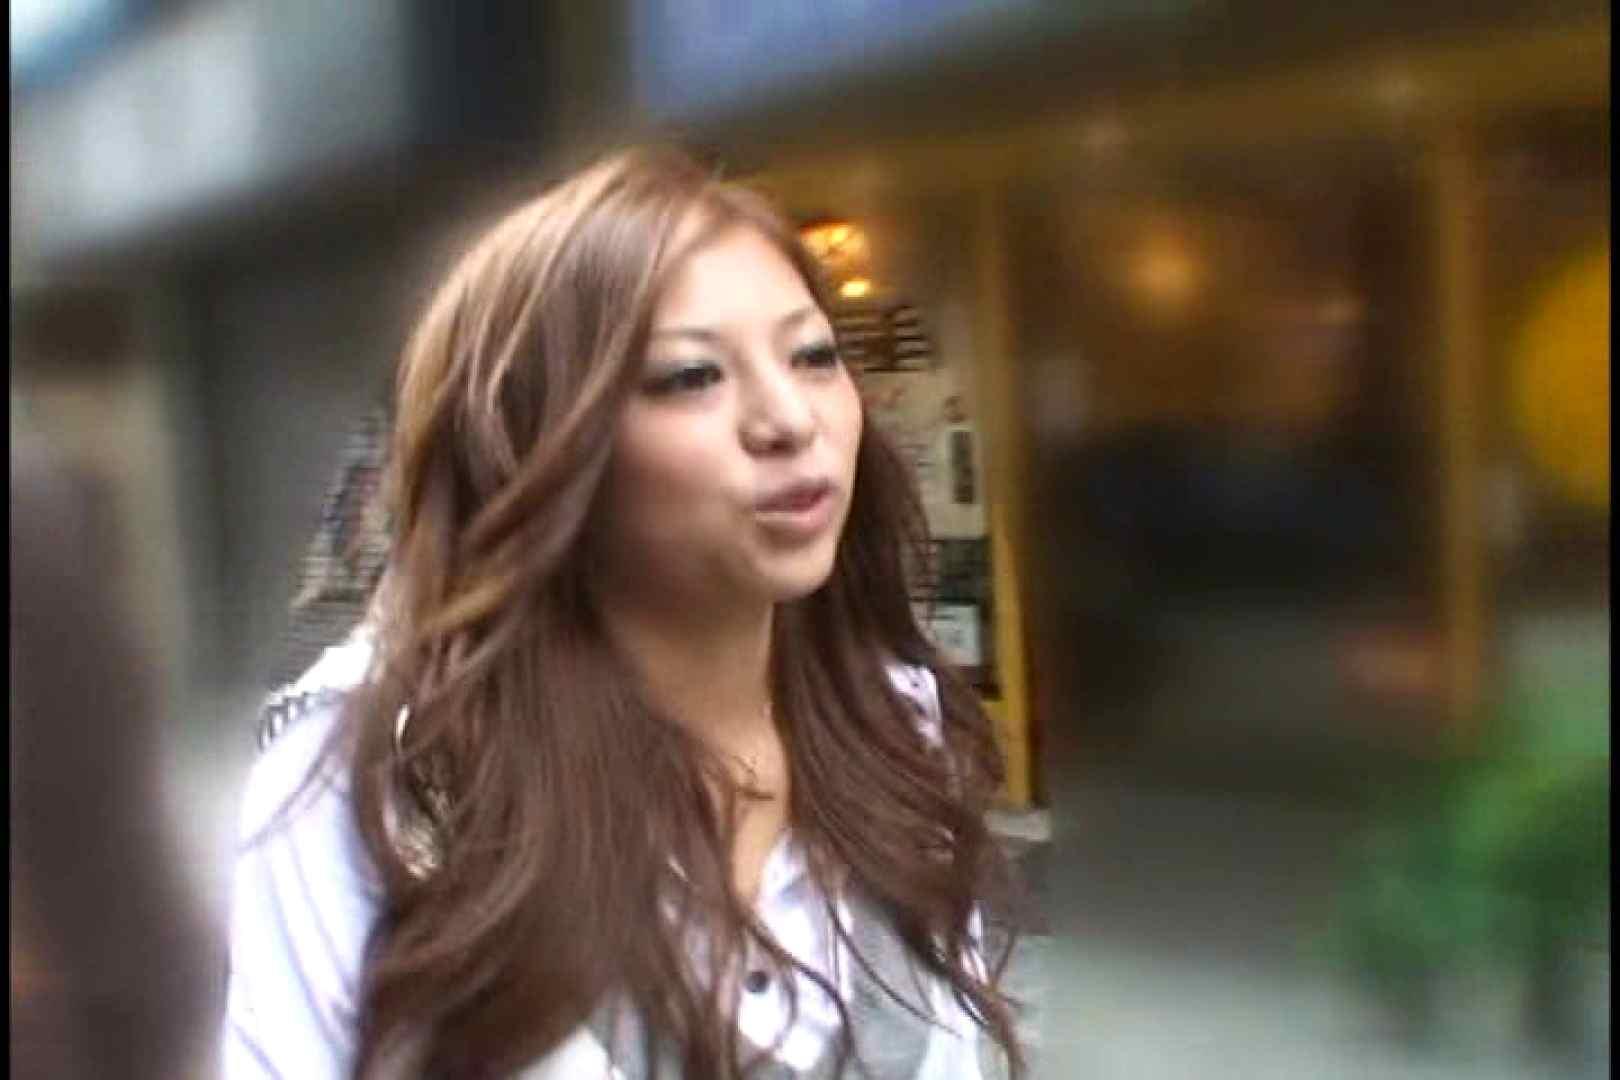 JDハンター全国ツアー vol.032 後編 女子大生のエロ動画  83PIX 2